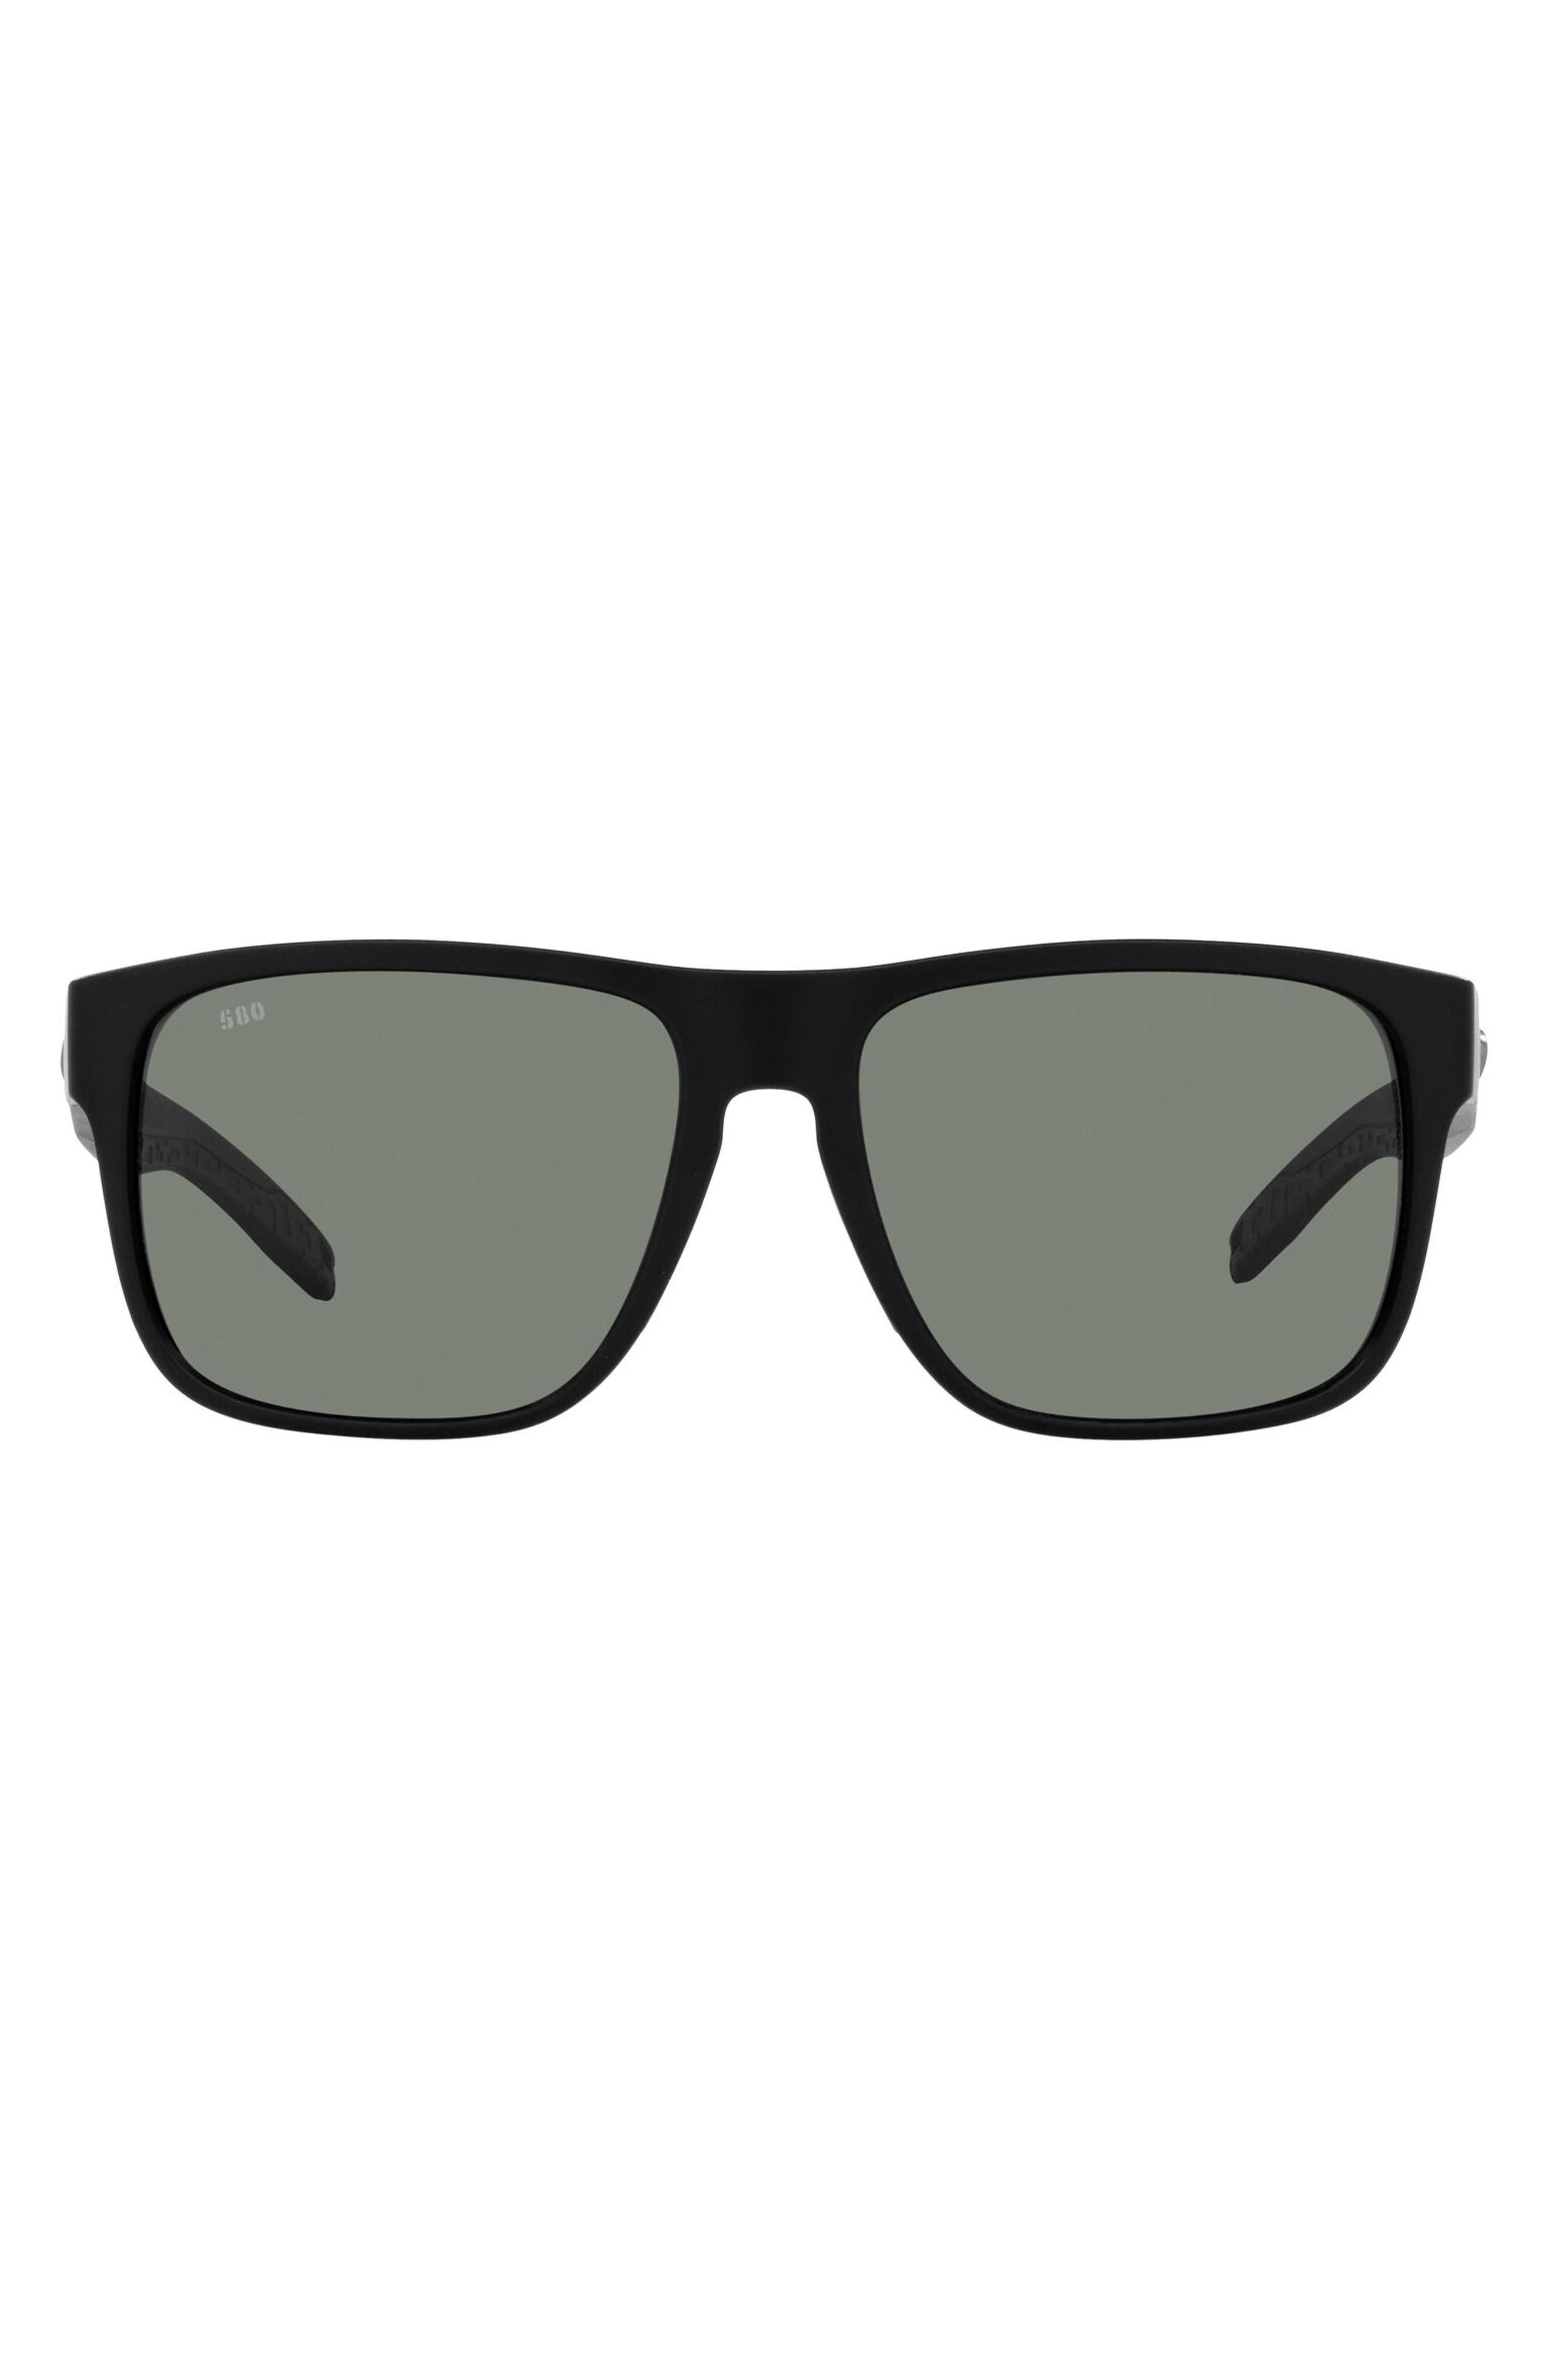 59mm Polarized Square Sunglasses